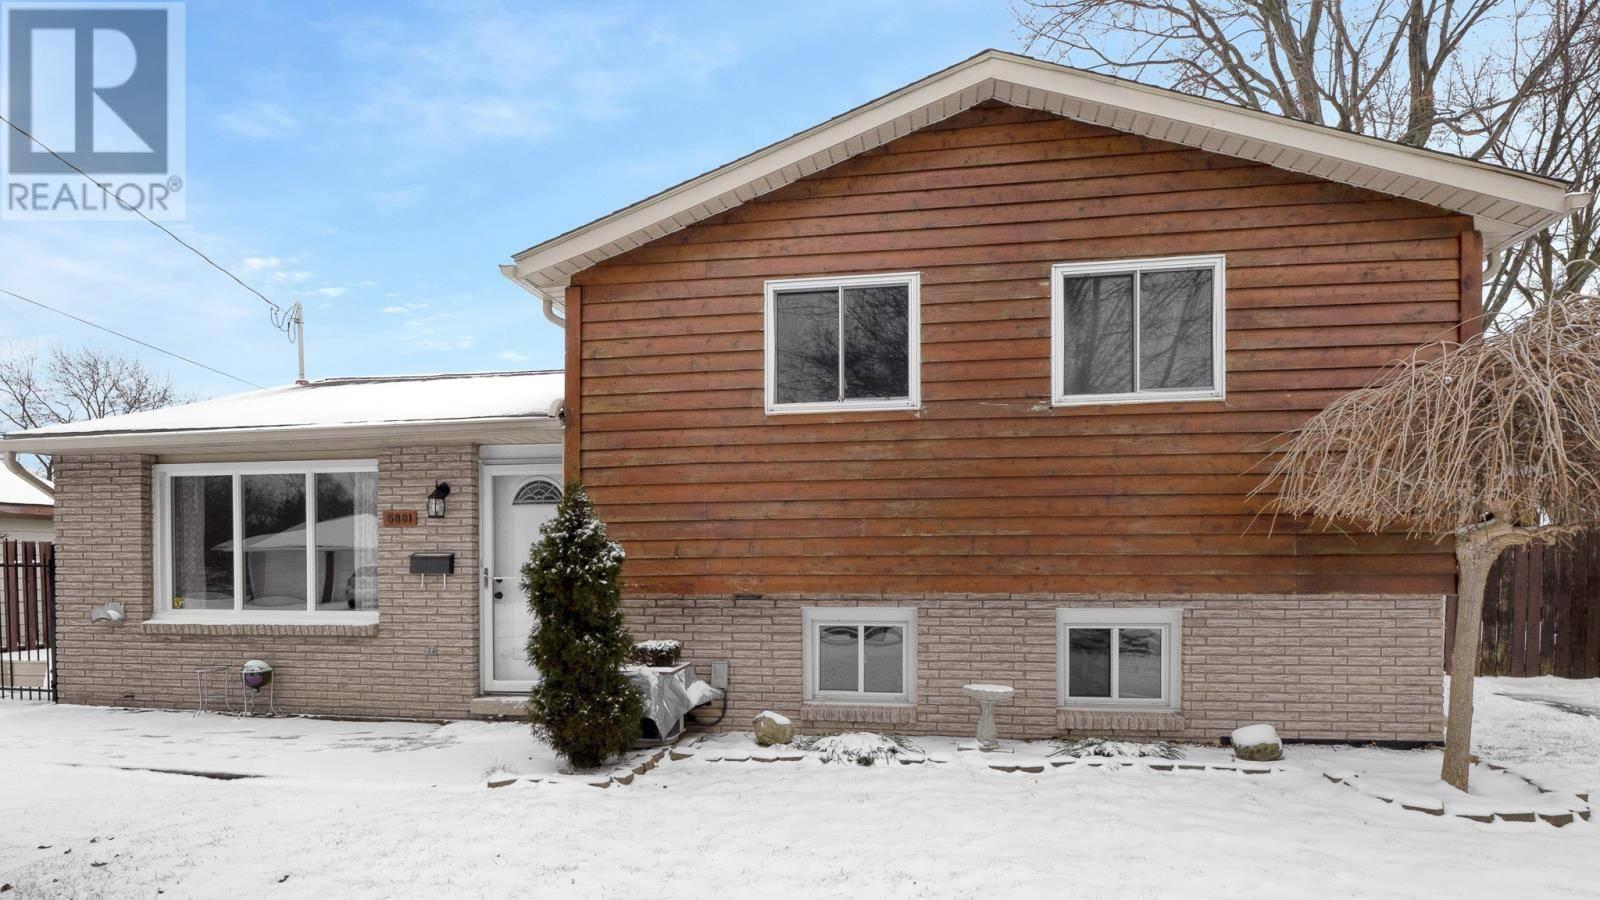 House for sale at 5881 Reginald  Windsor Ontario - MLS: 20003542